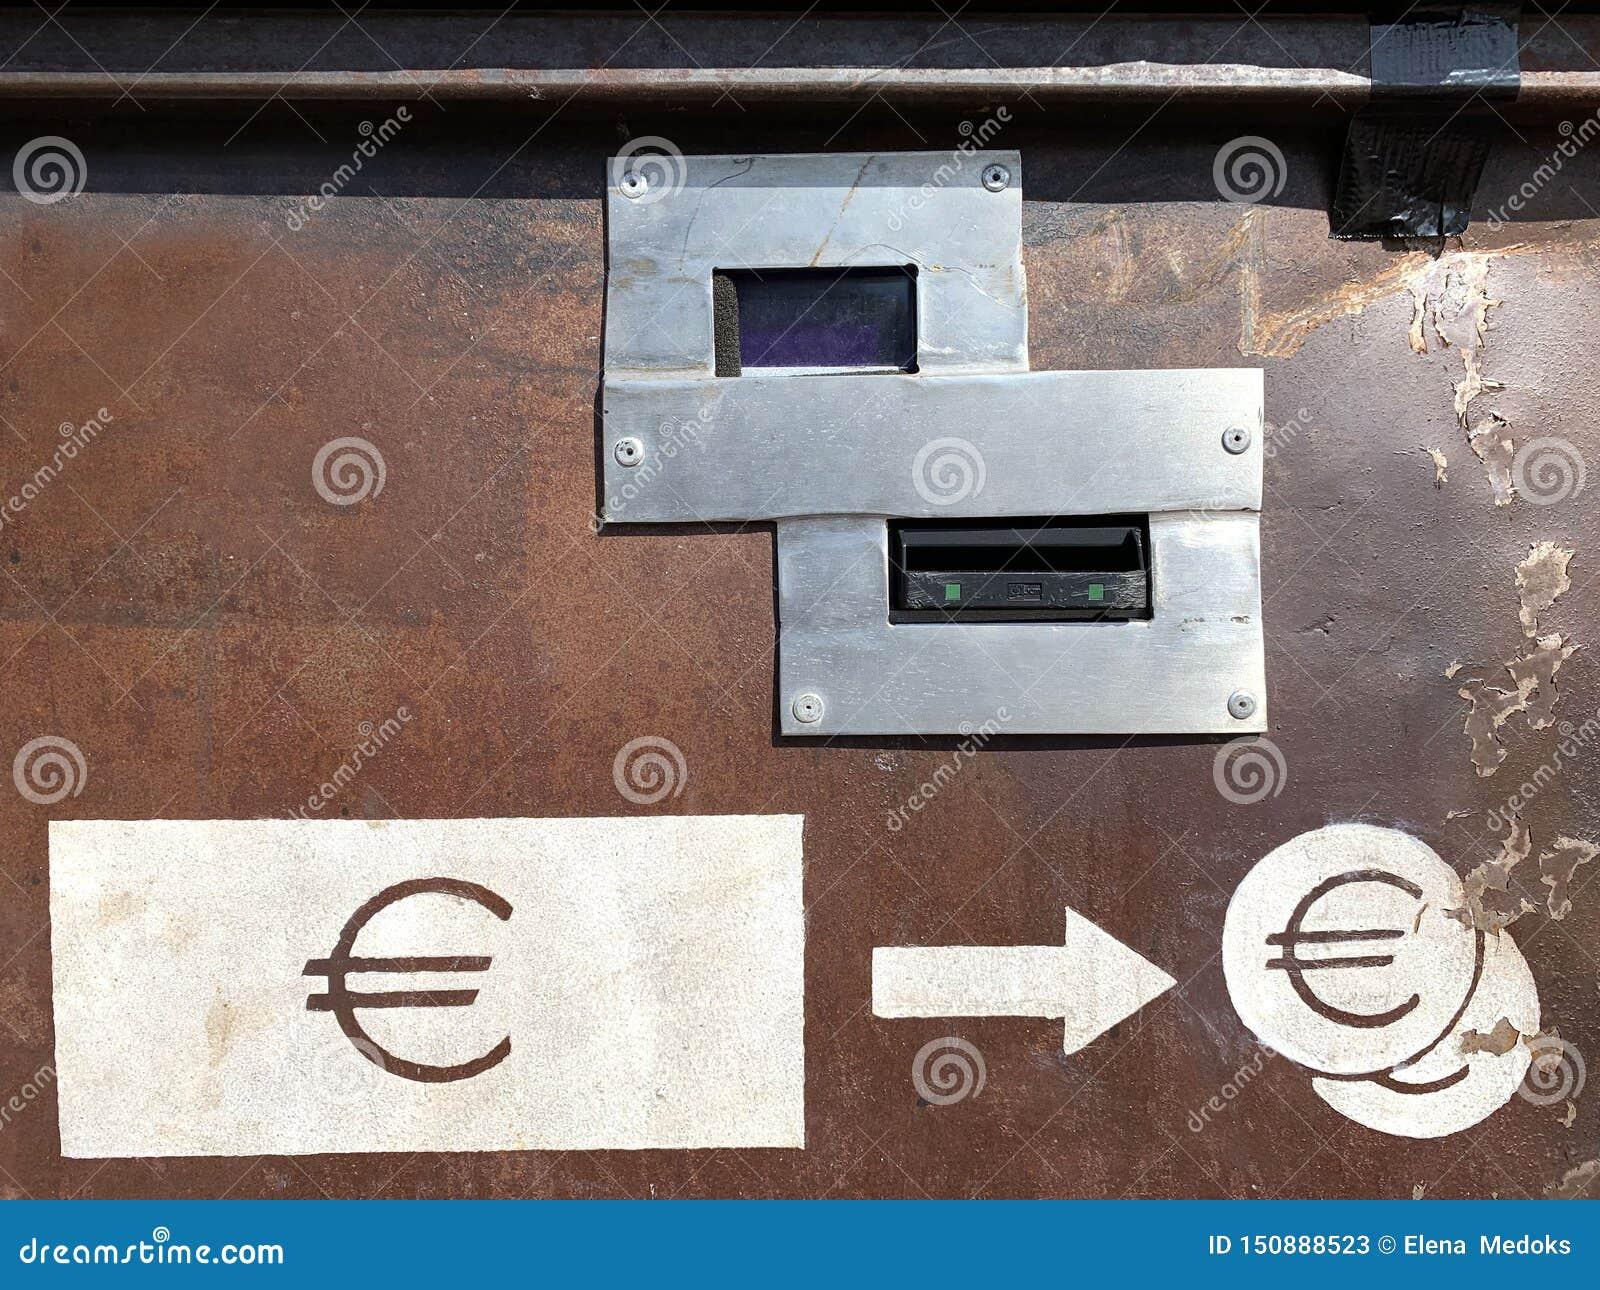 Europapiergeldaustauschmaschine